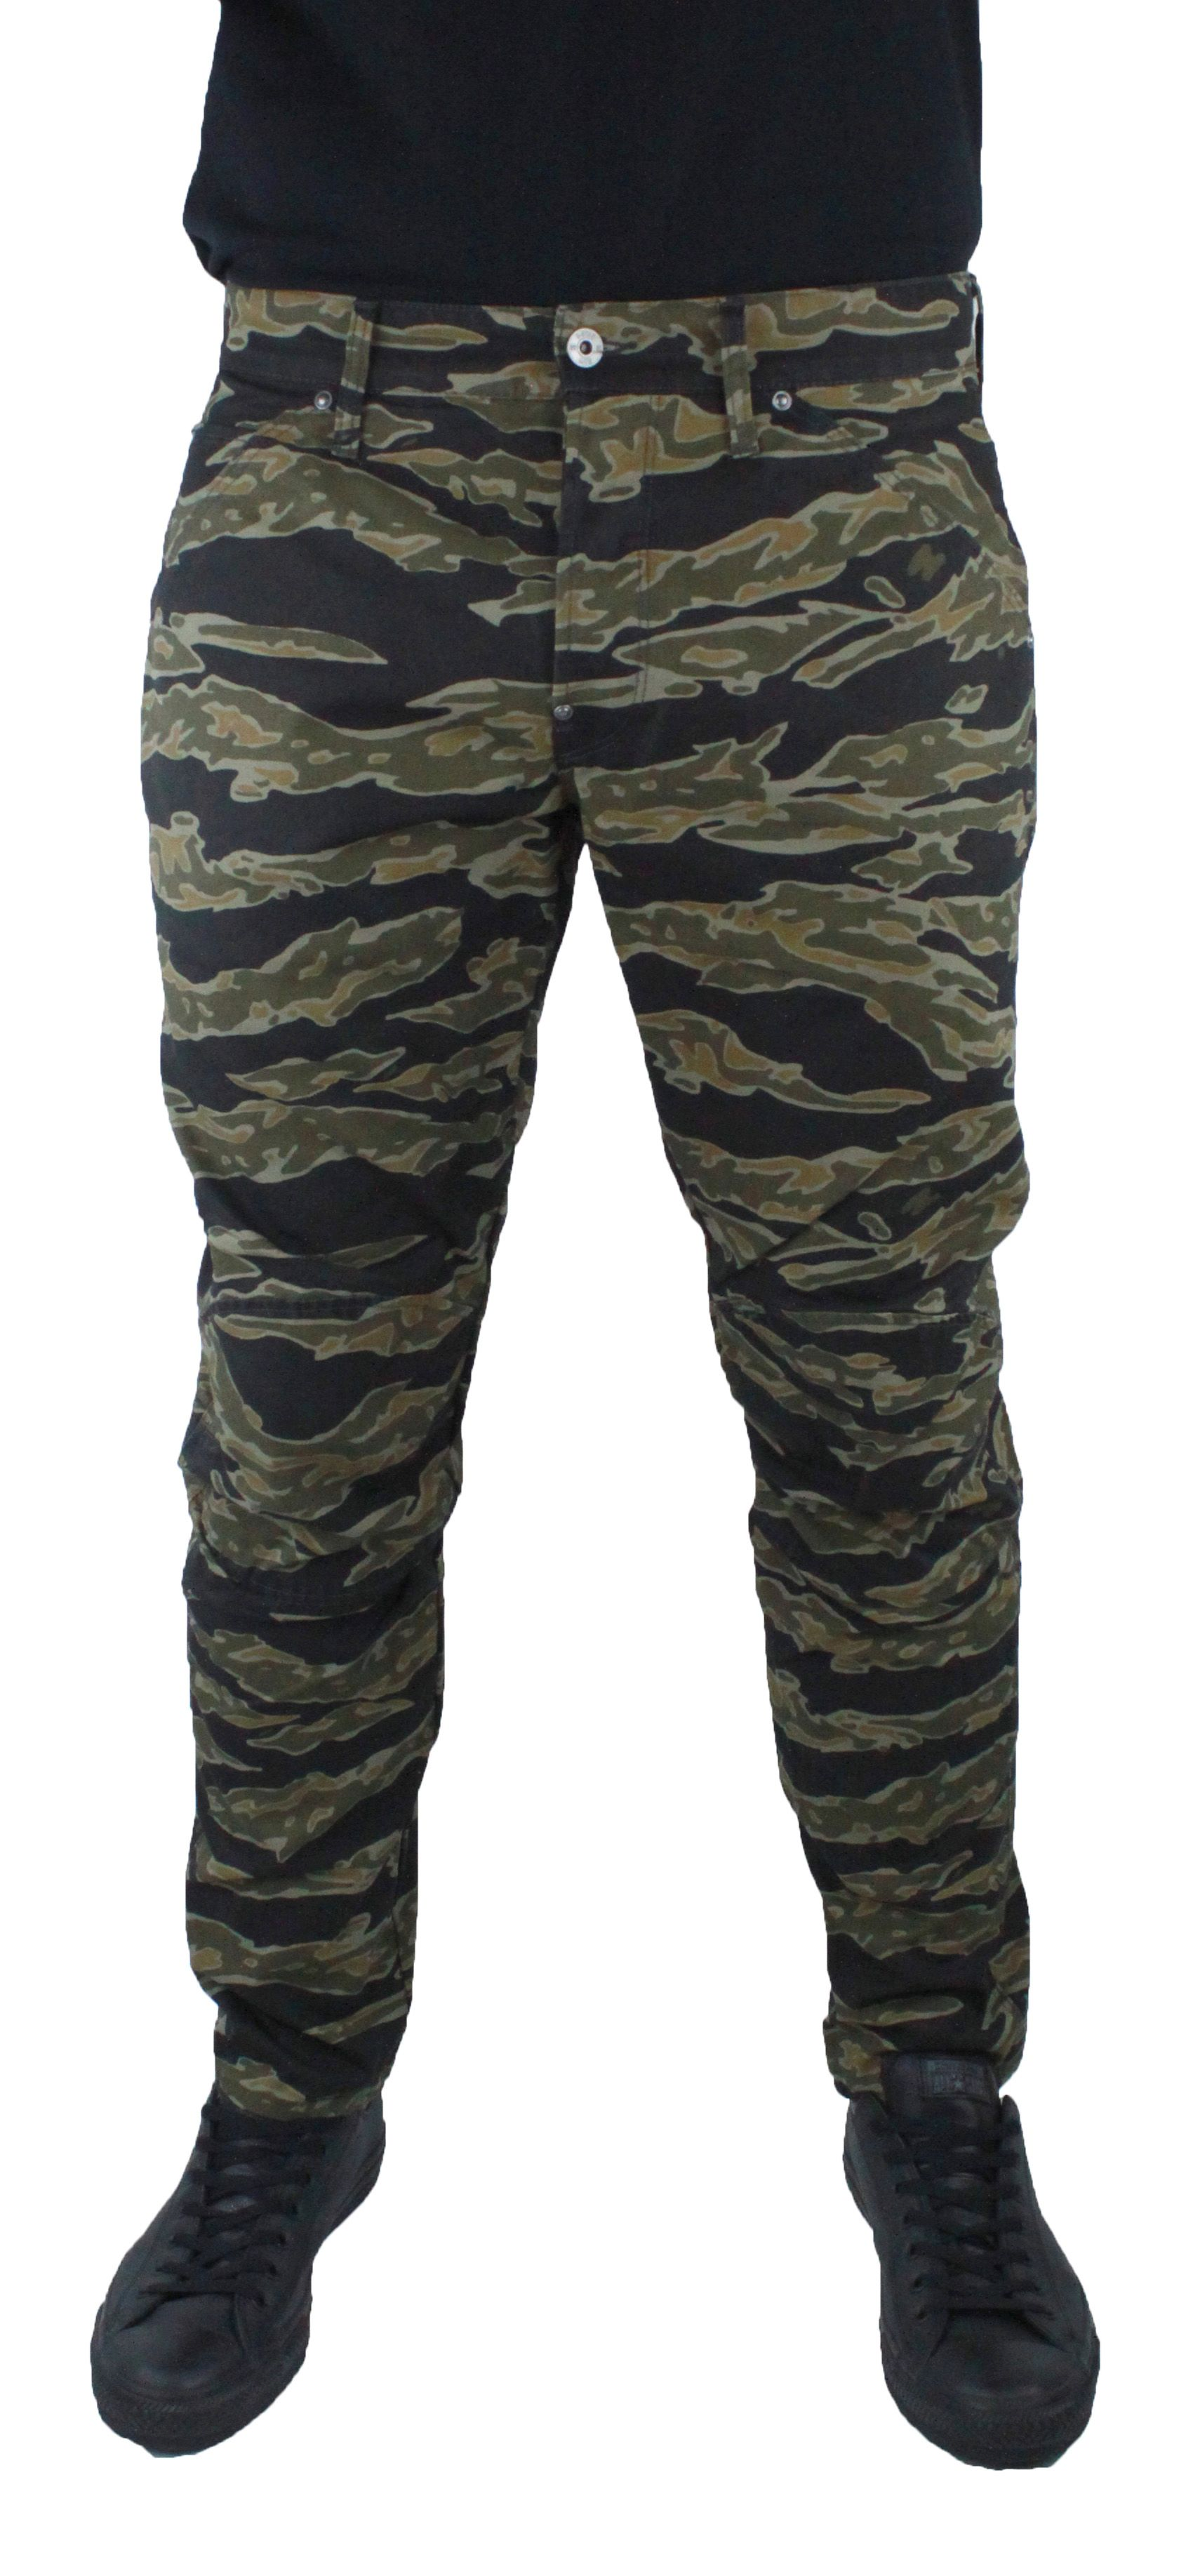 G-Star 5622 3D Tapered COJ Camo 8673 Jeans